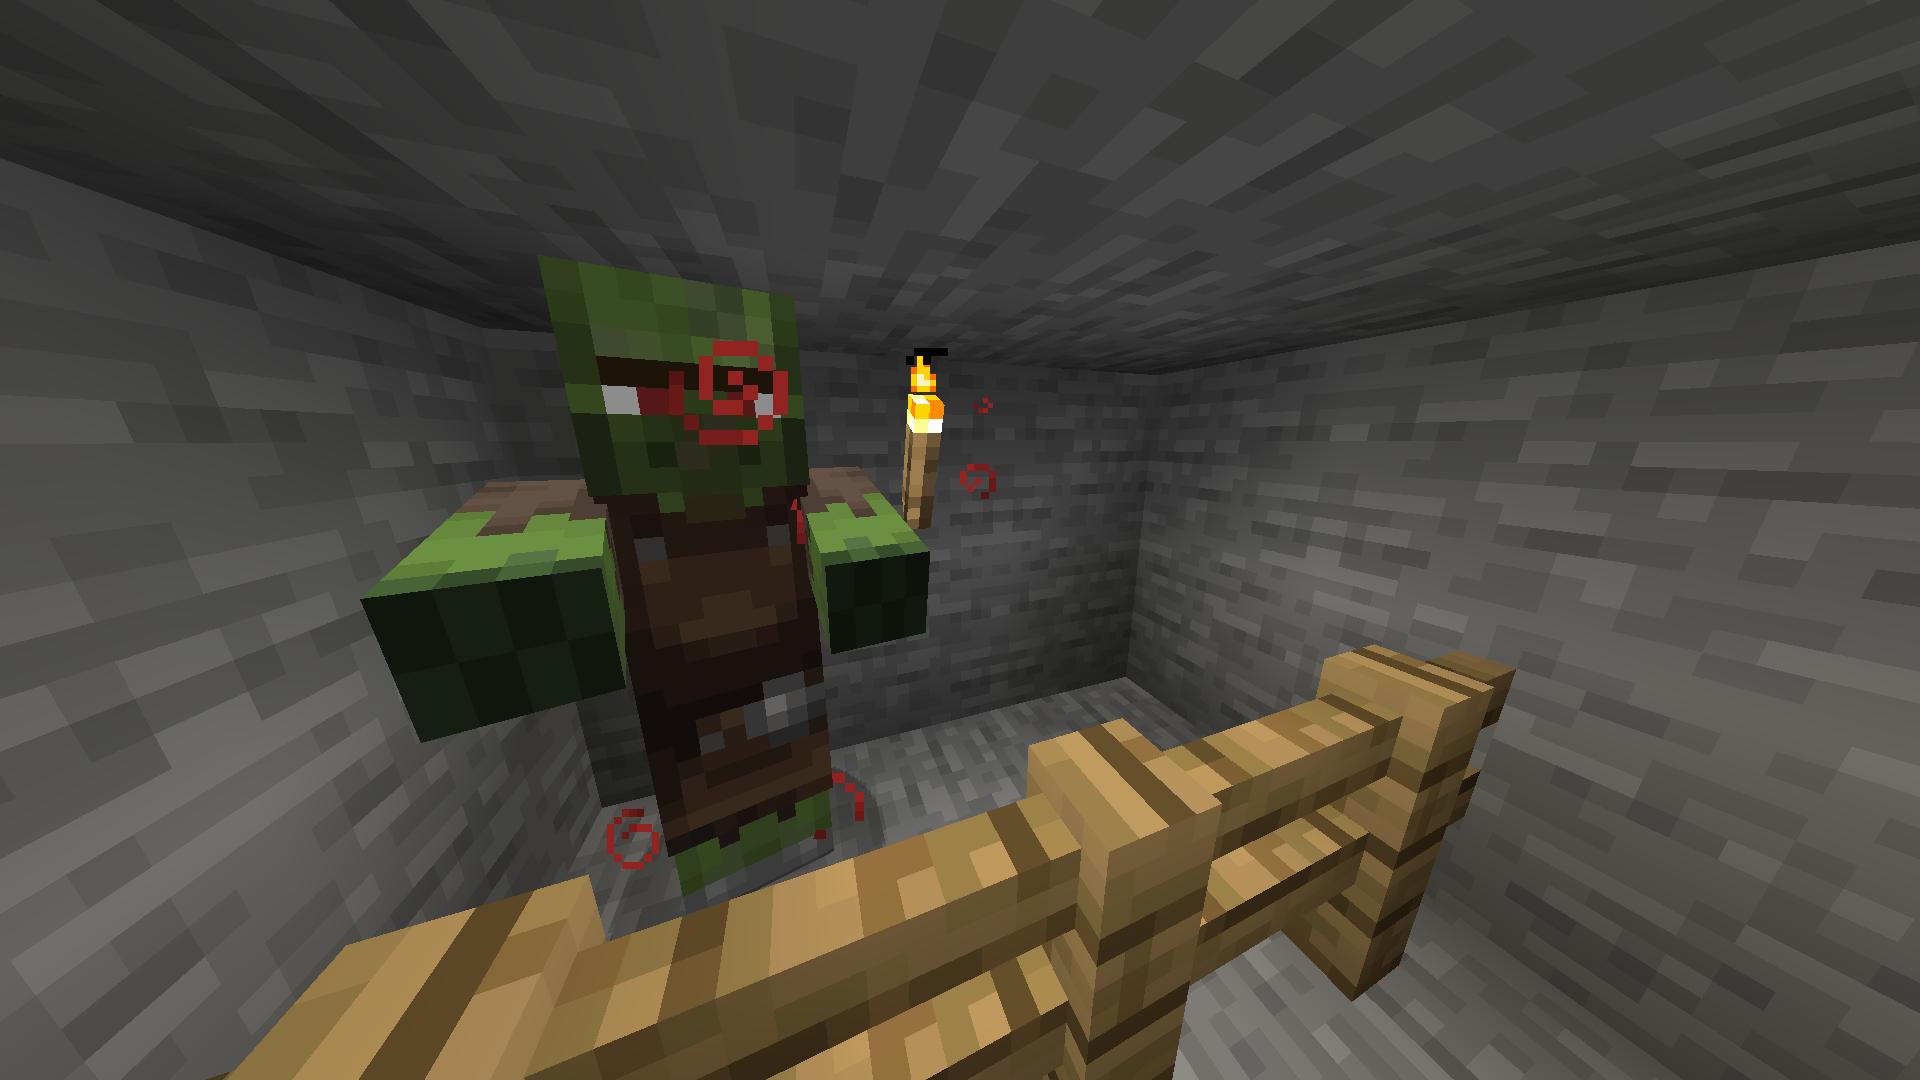 MC-12] Cured zombie villagers lose profession - Jira